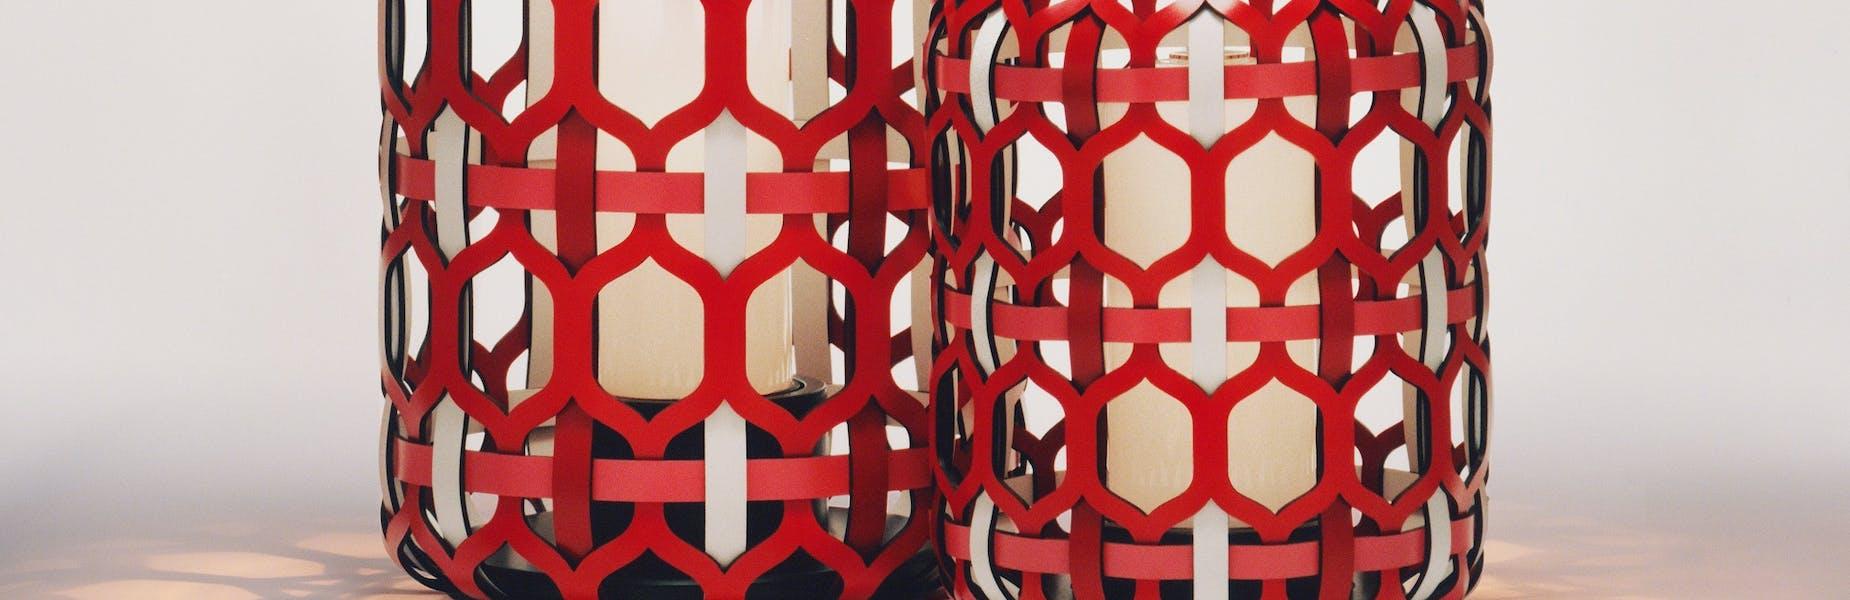 Louis Vuitton Objets Nomades Lanterne by Zanellato / Bortotto